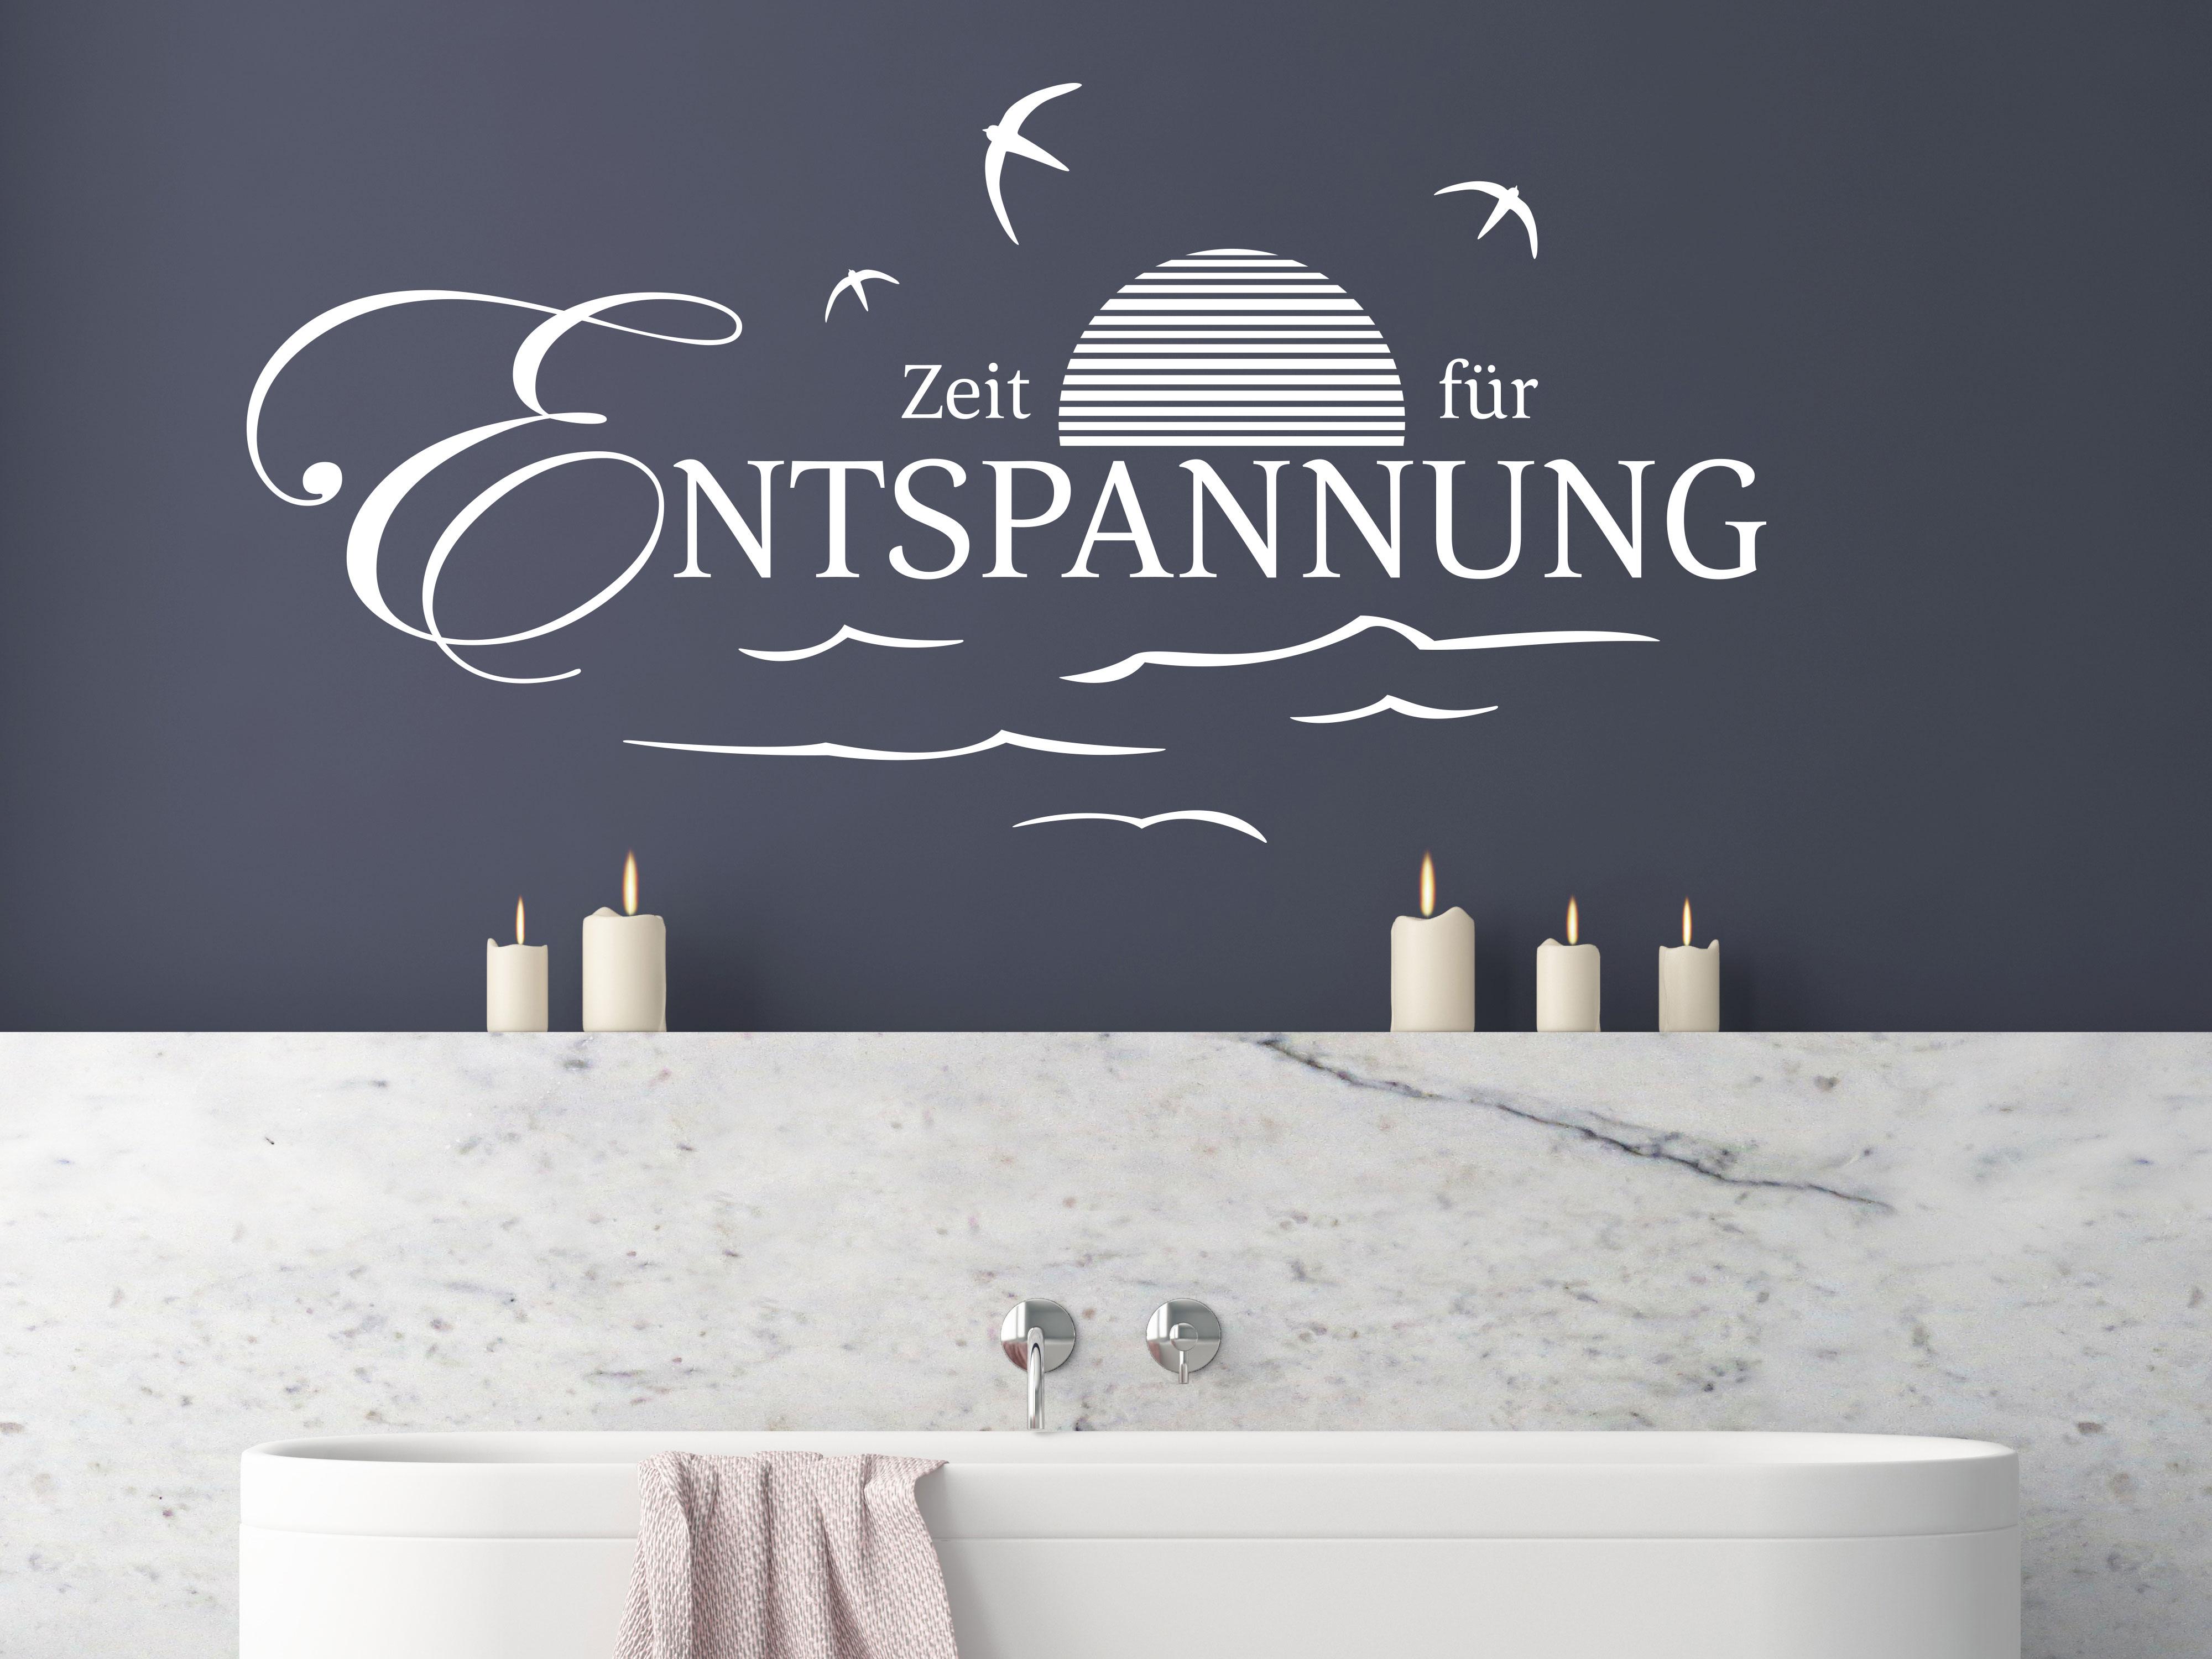 Wandtattoos & Wandbilder Wandtattoo Badezimmer Sprüche ...